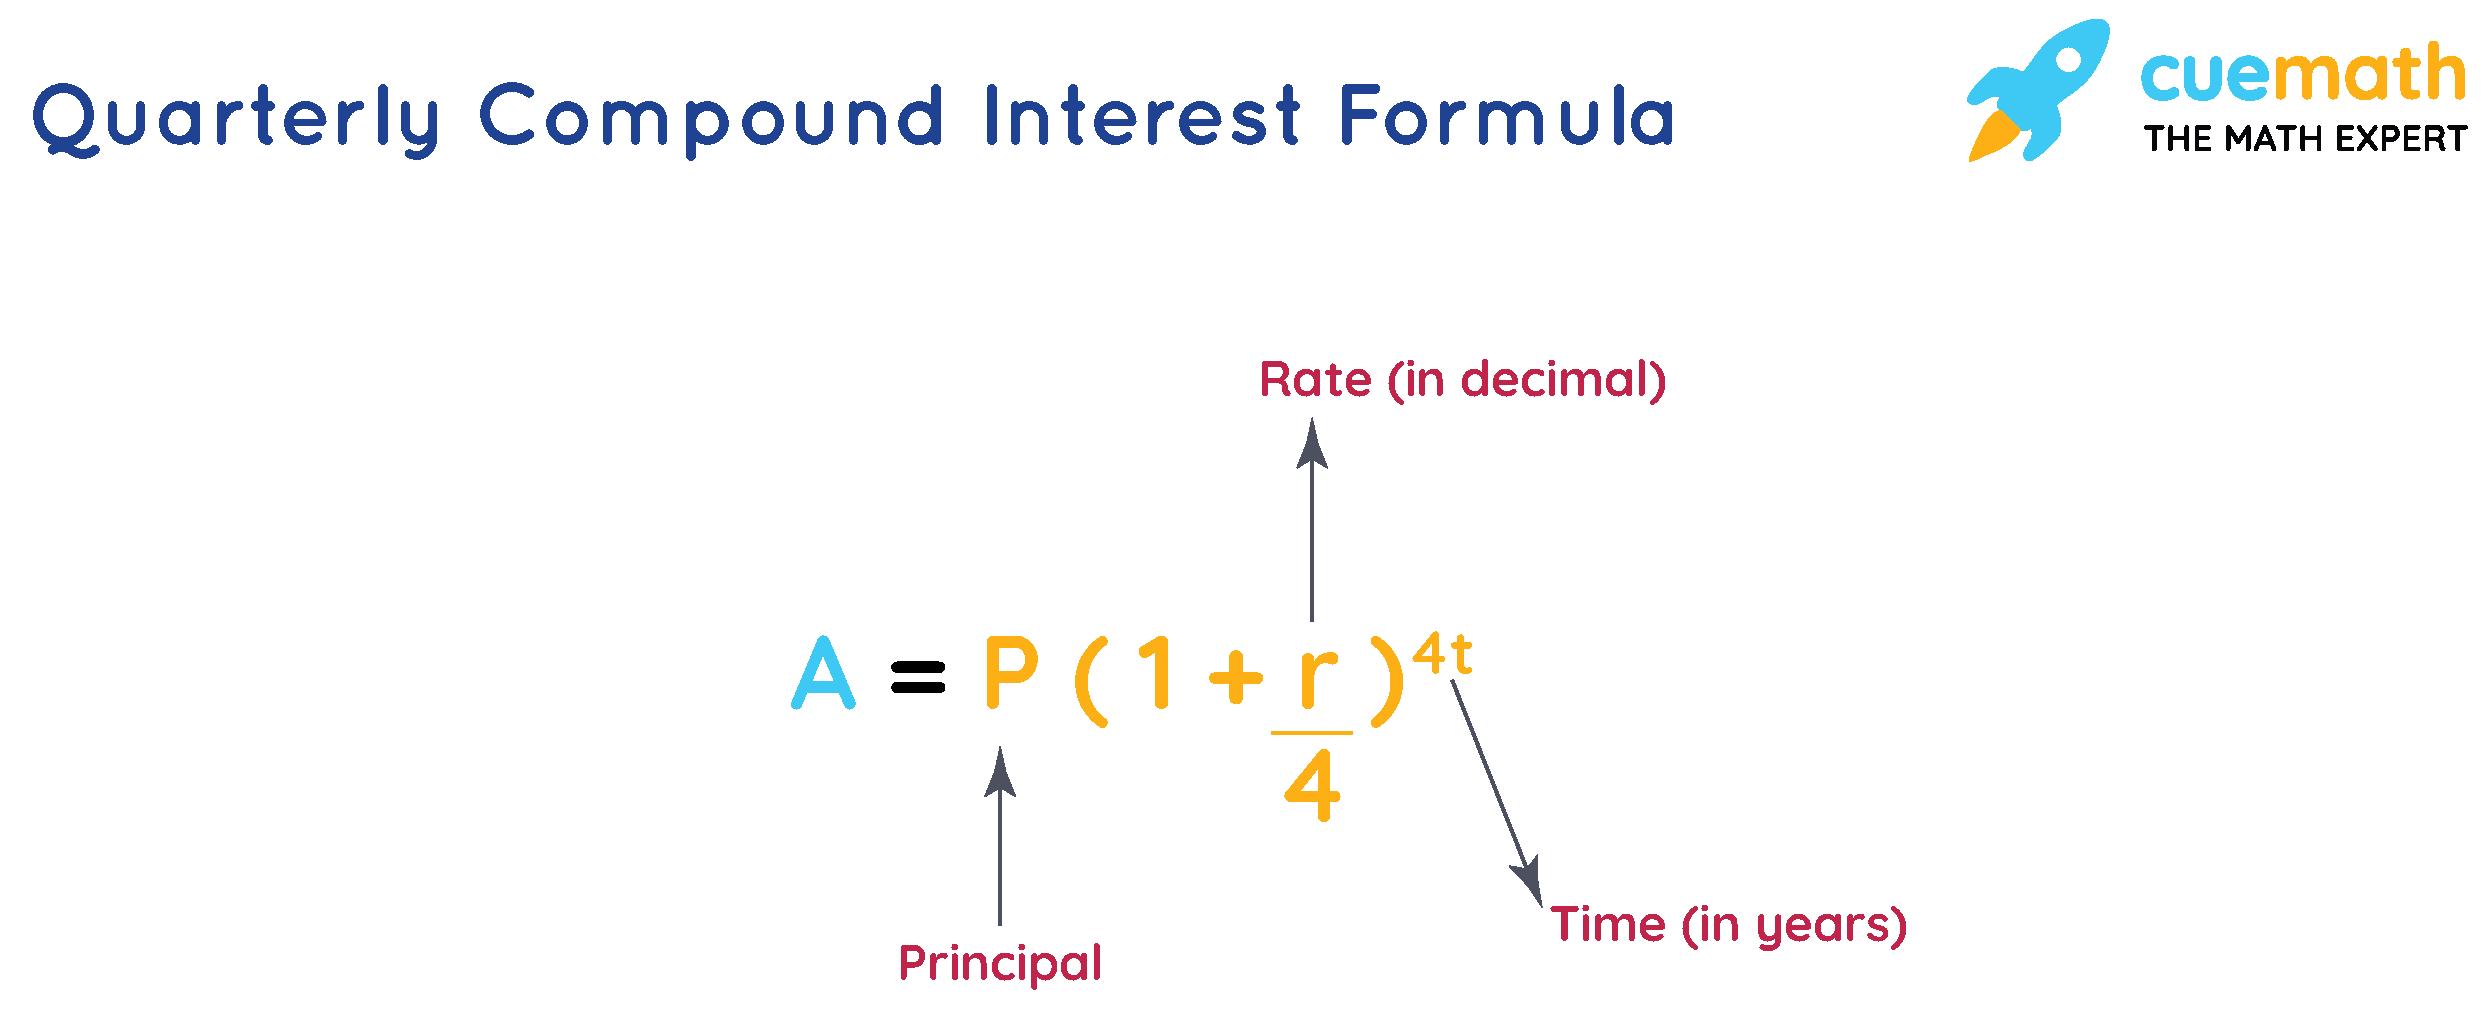 Quarterly Compound Interest Formula